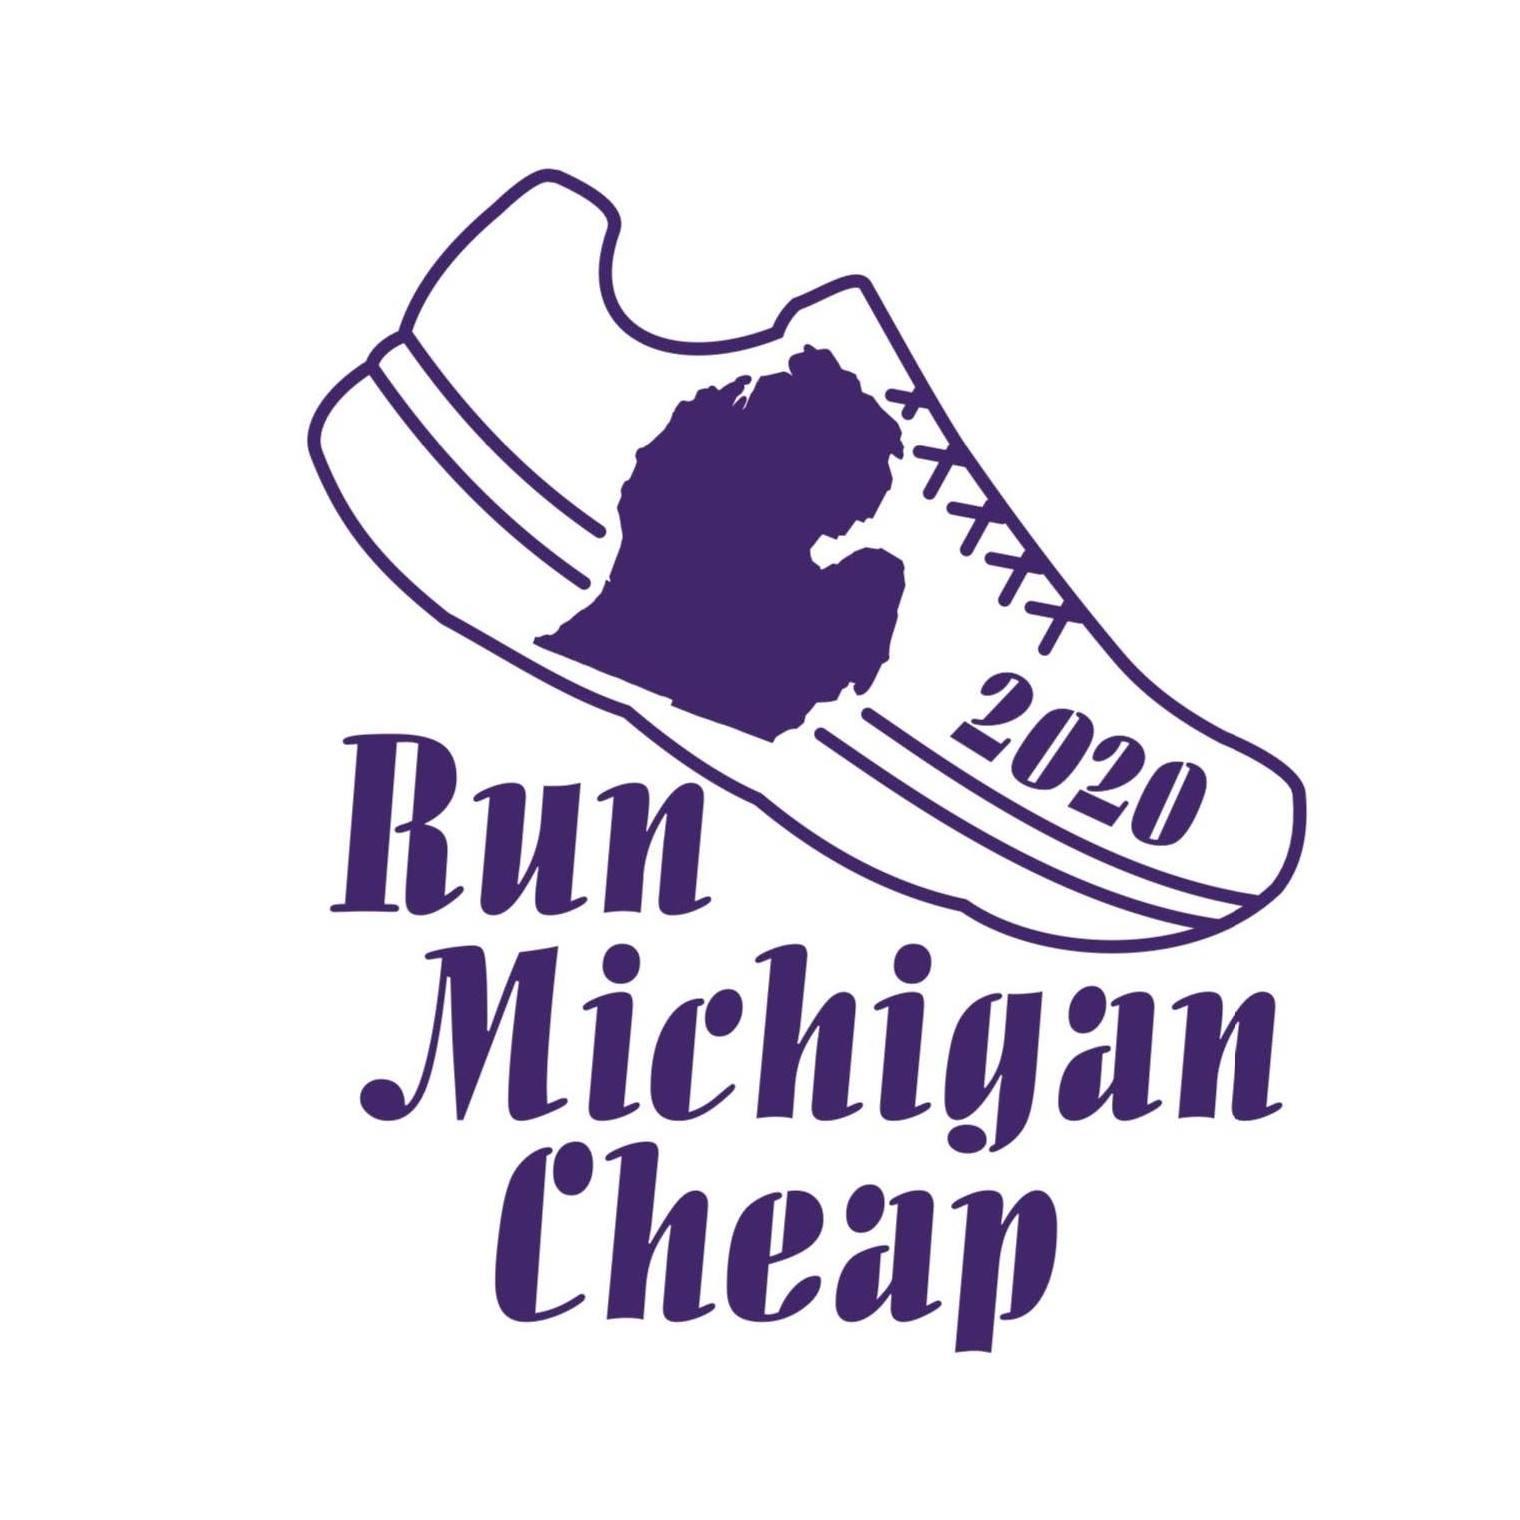 Halloween Events Midland Michigan 2020 Race event   Midland Halloween Race   Run Michigan Cheap   Racecheck